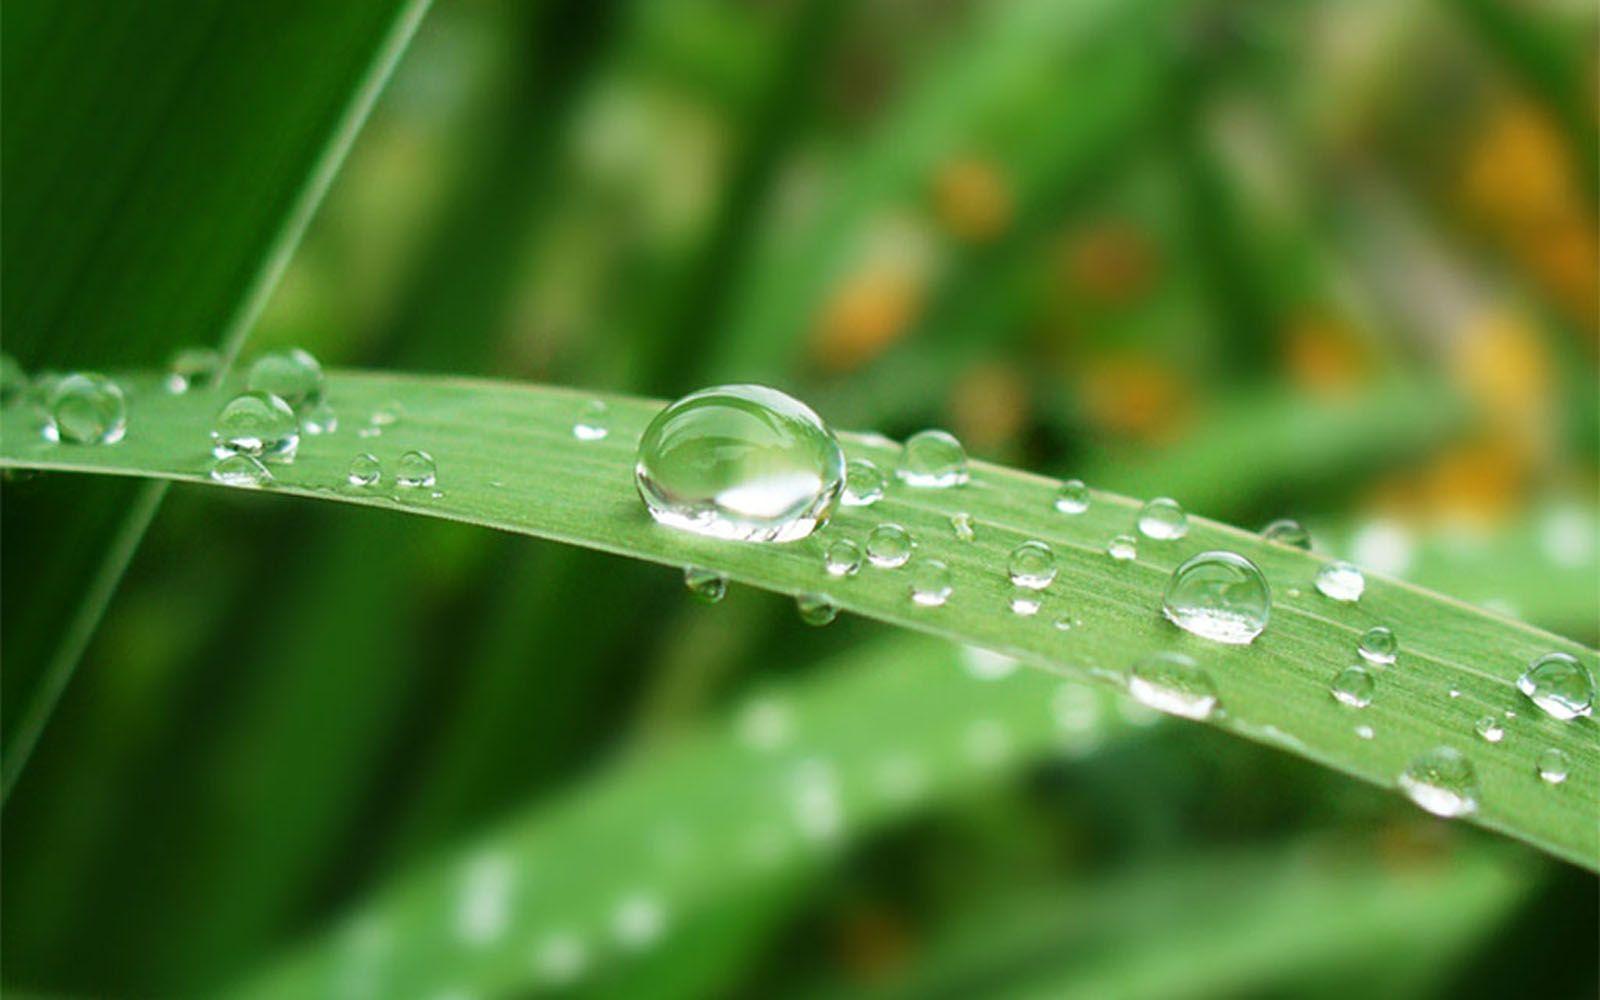 wallpapers: morning dew photographs | dew | pinterest | morning dew